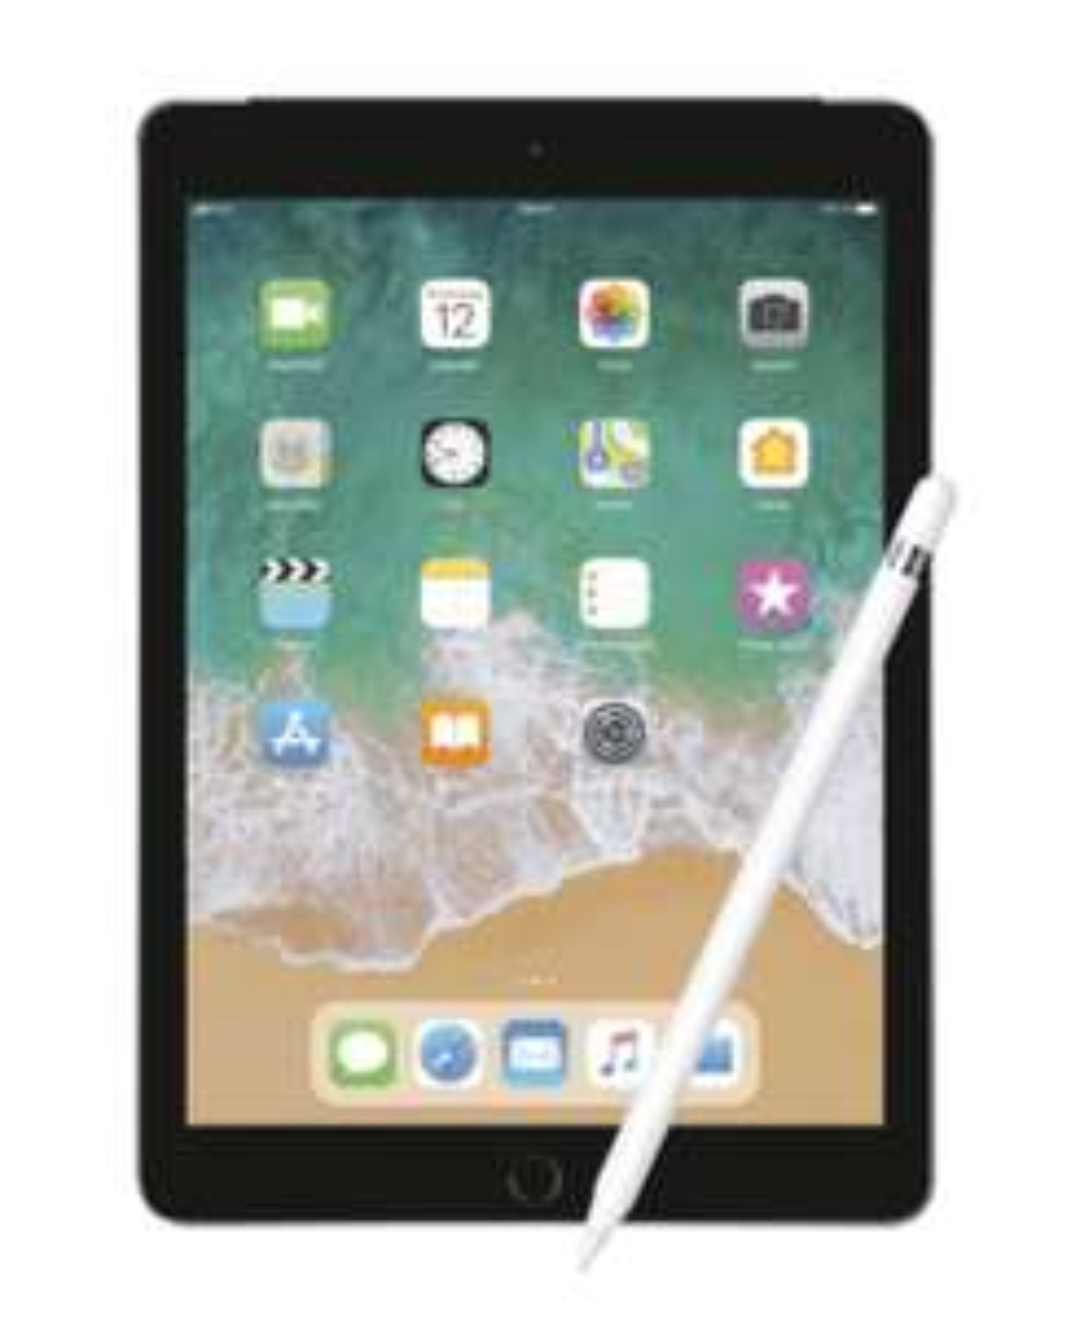 Apple iPad 2018 32GB Wi-Fi + Cellular & Apple Pencil + 5 GB Vodafone LTE Datentarif mobilcom-debitel